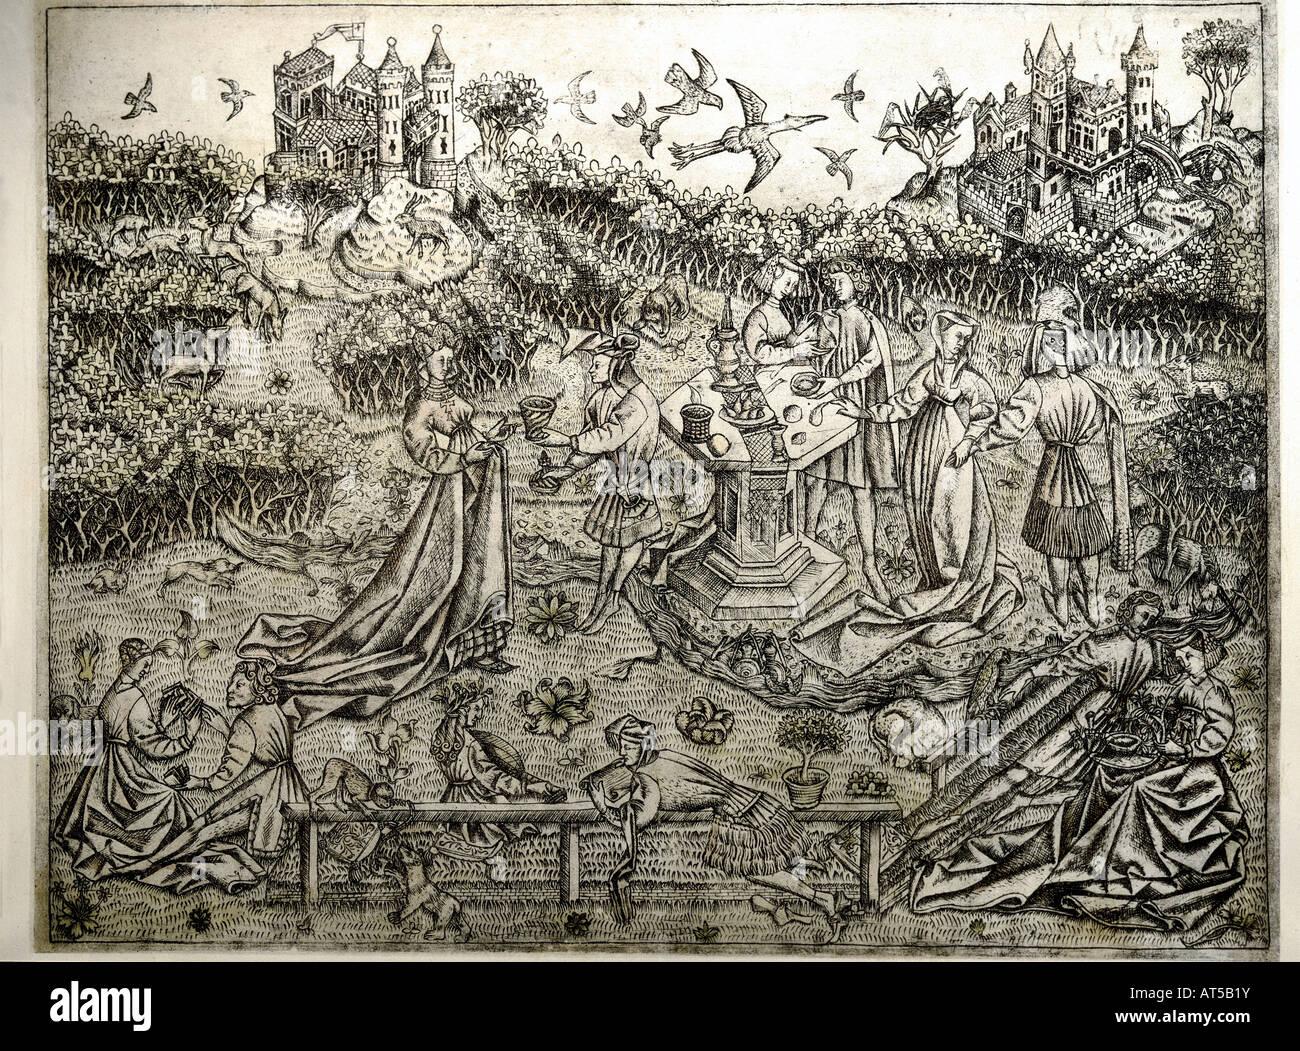 fine arts, Middle Ages, mediaeval, copper engraving, 'Der große Liebesgarten' (The big garden of love), - Stock Image